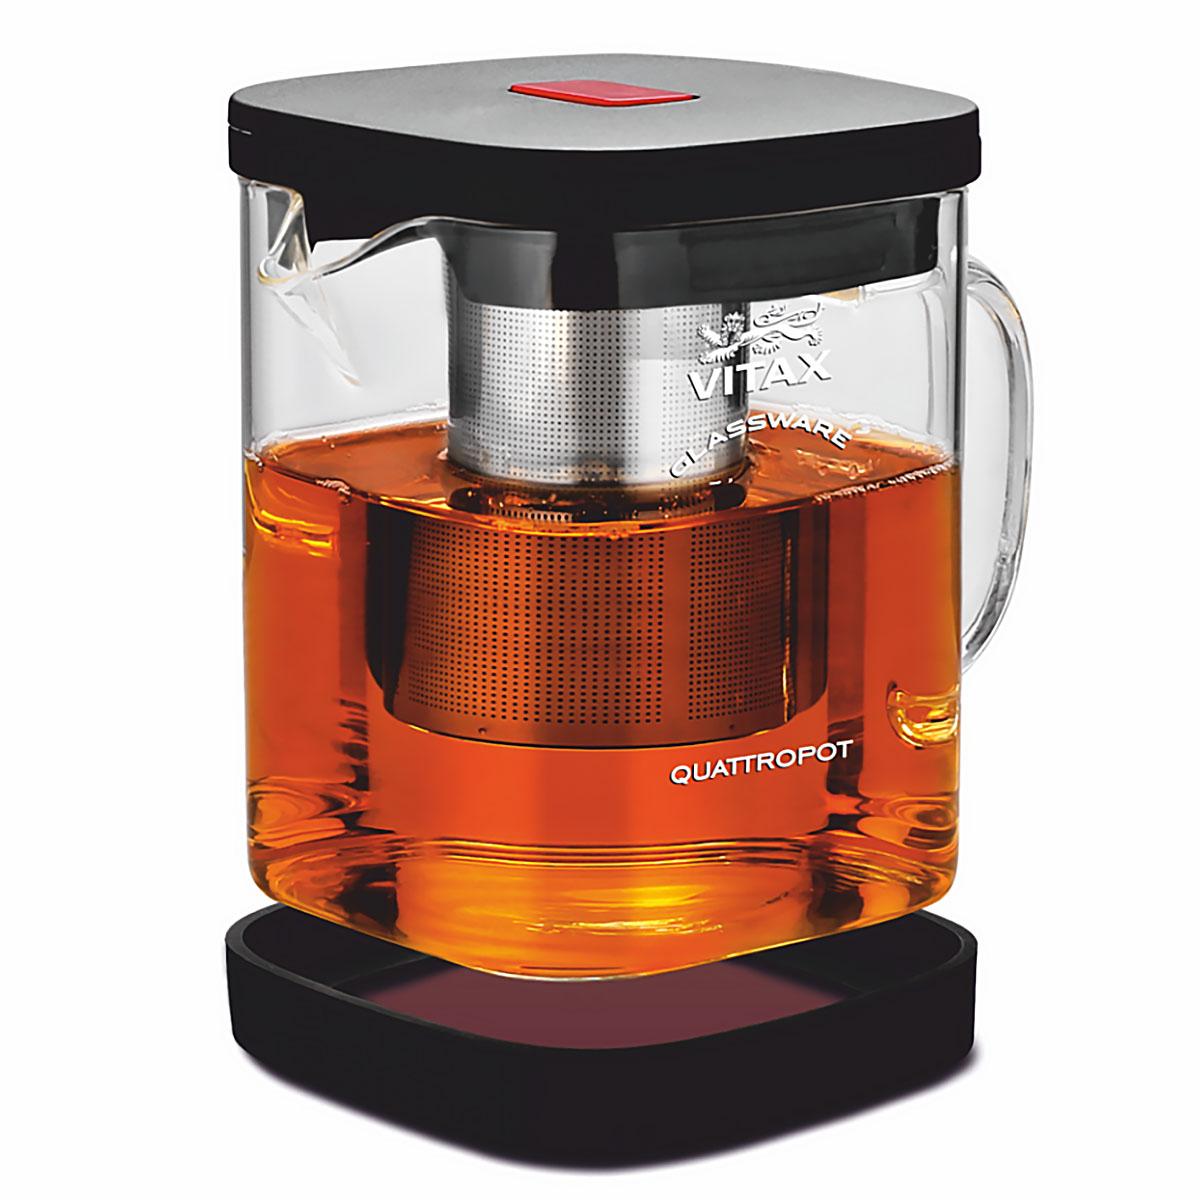 Чайник заварочный Vitax VX-3310 Warkworth 4 в 1, 900 мл